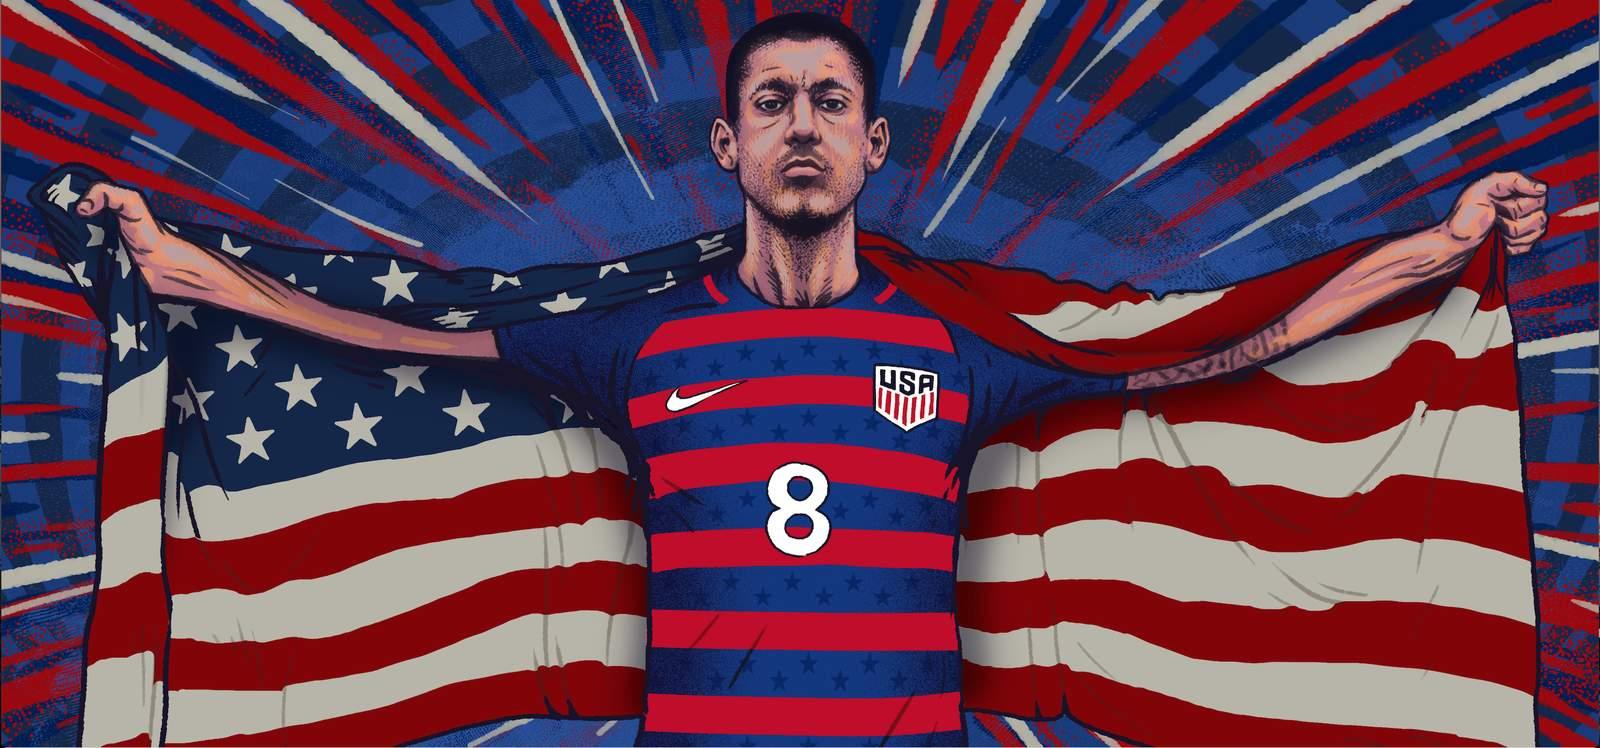 Fussball America Cup